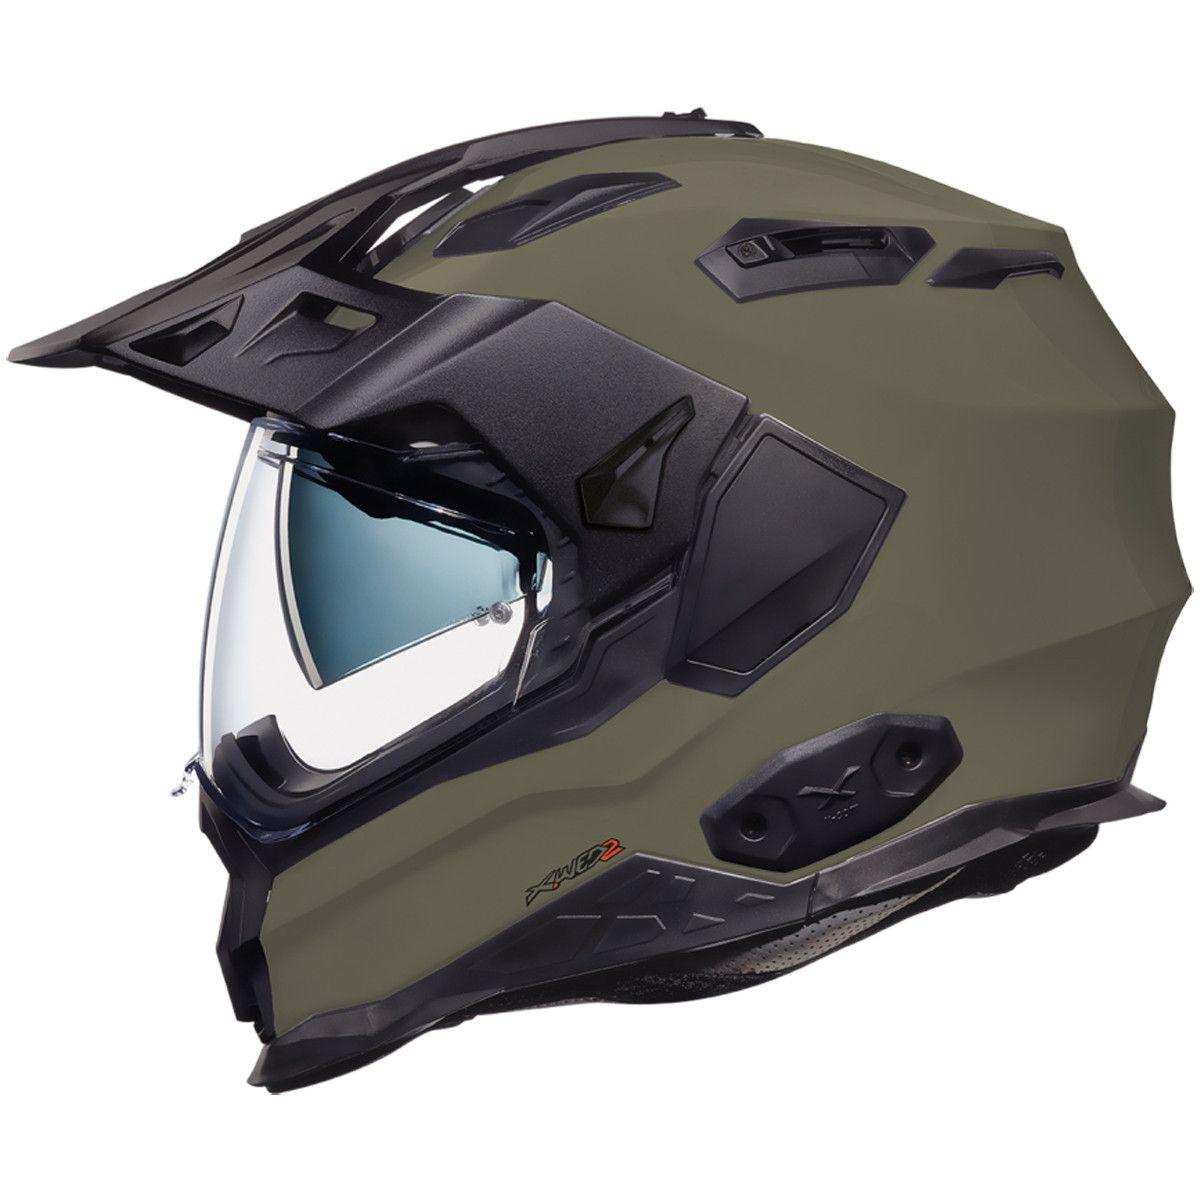 Nexx X.WED 2 Plain Helmet in Khaki The all new X.WED 2